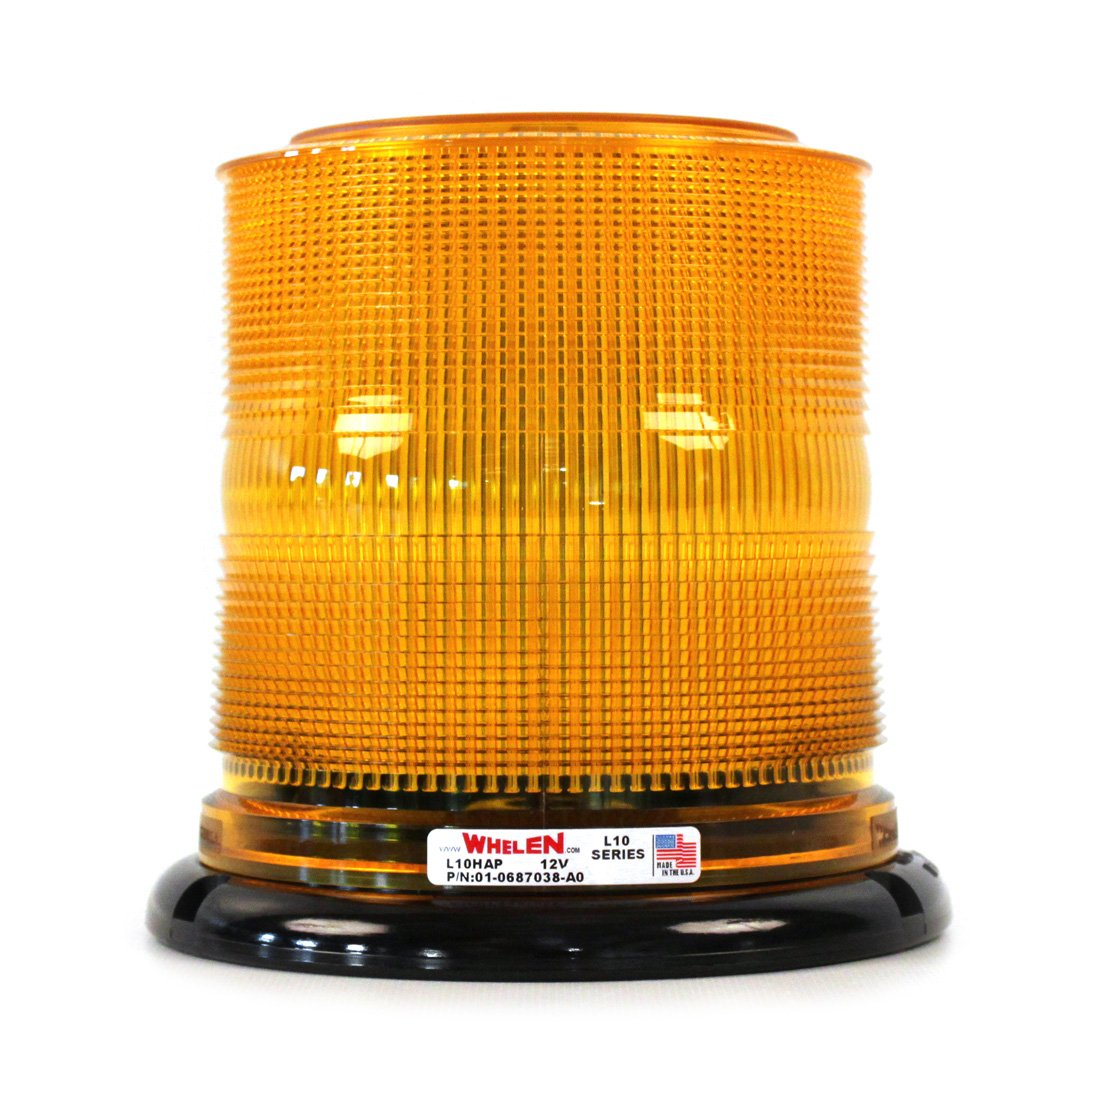 Whelen L10 Series Economy Permanent LED Beacons - Amber